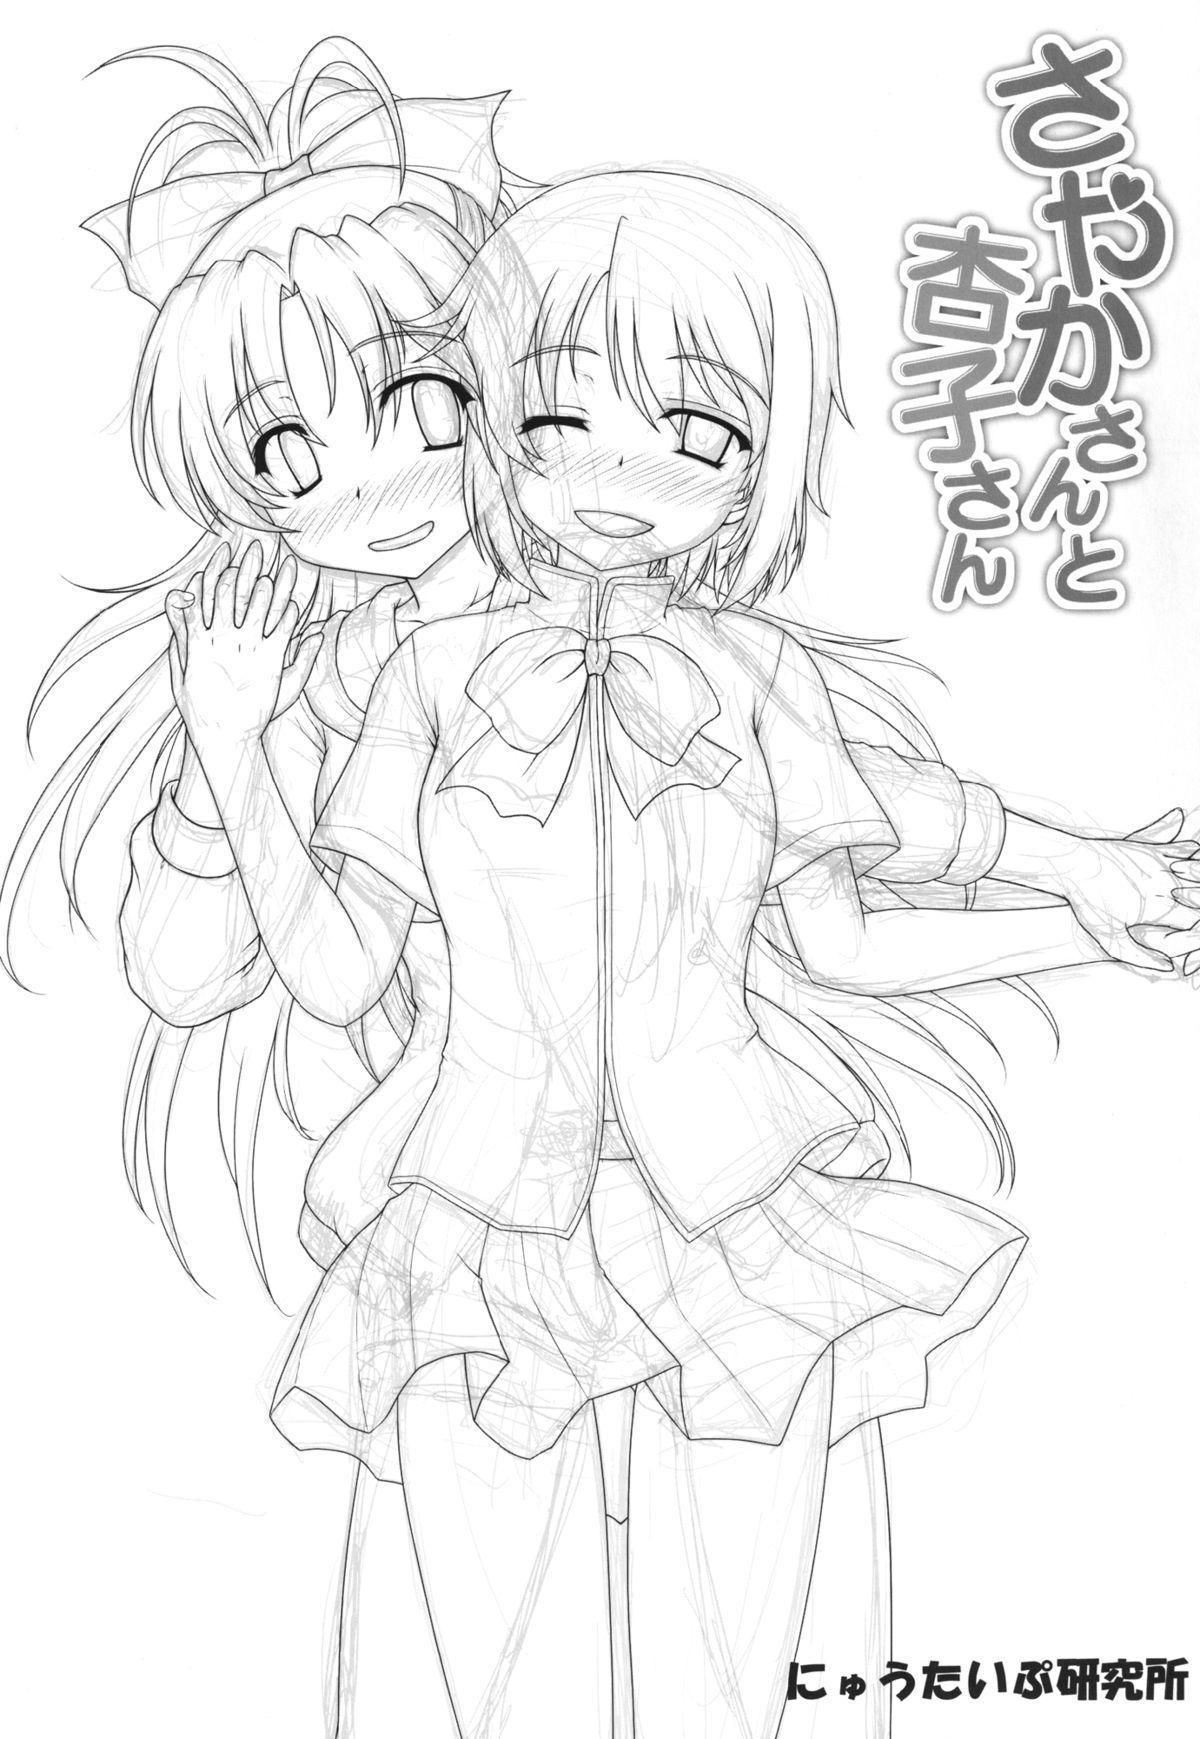 (SHT2013 Haru) [Newtype Kenkyuujo (Kotowari)] Sayaka-san to Kyouko-san (Puella Magi Madoka Magica) 2